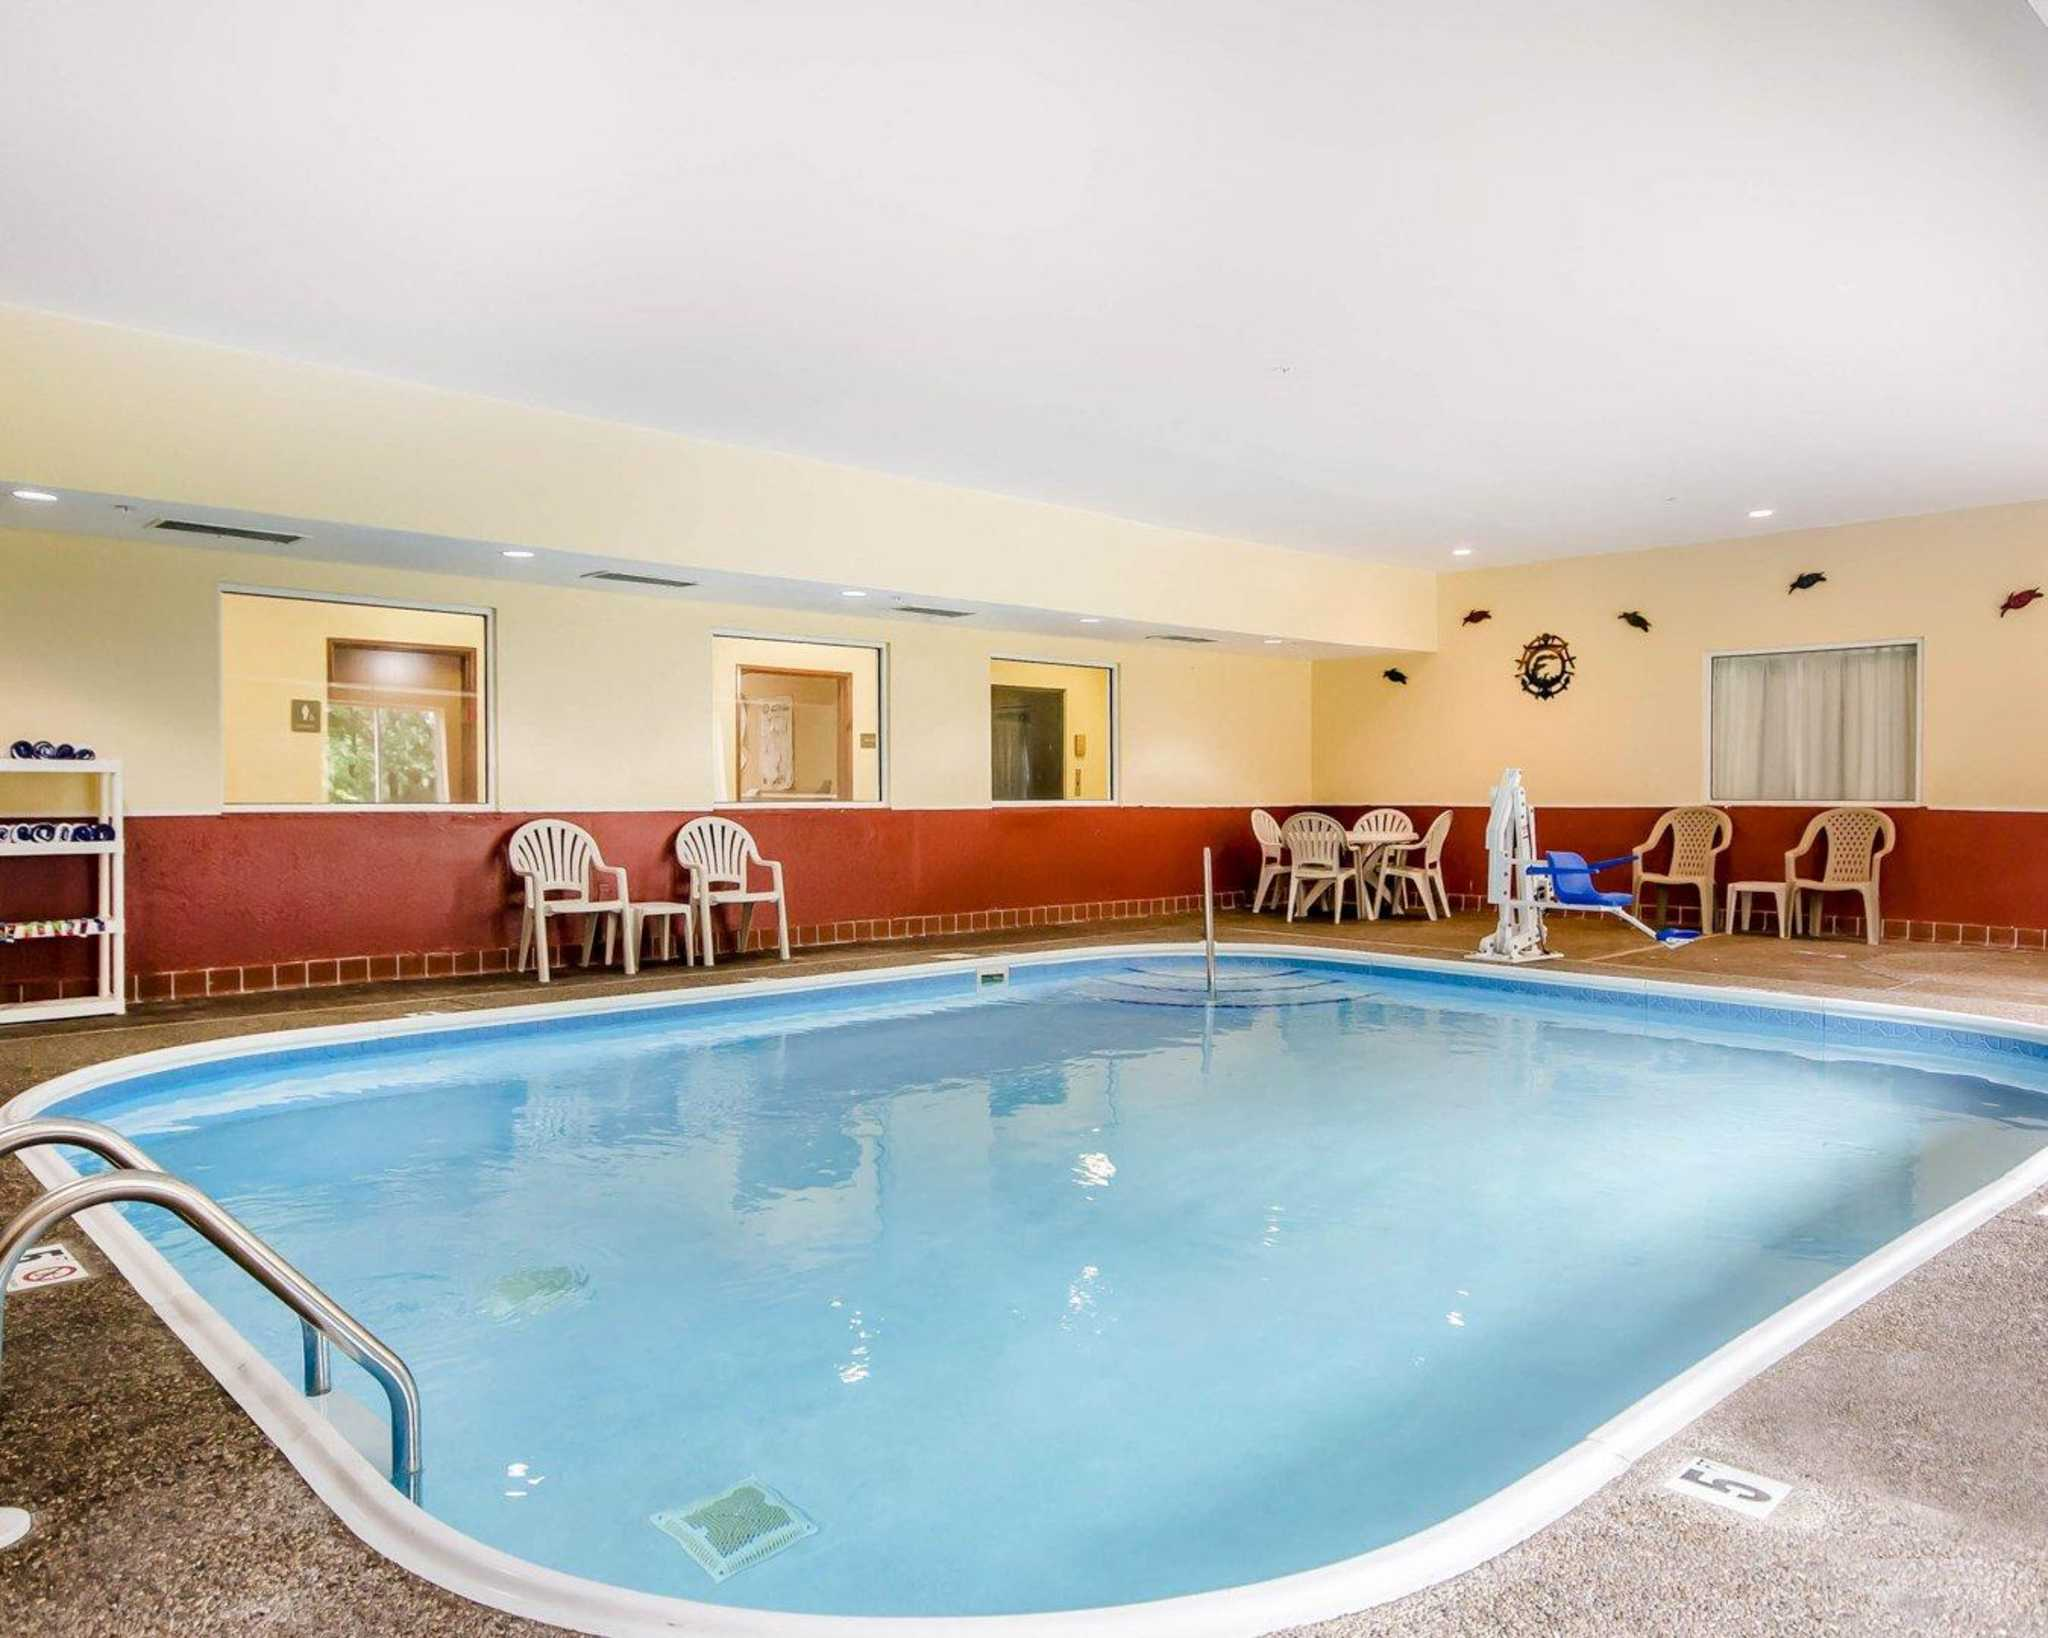 Quality Suites image 3